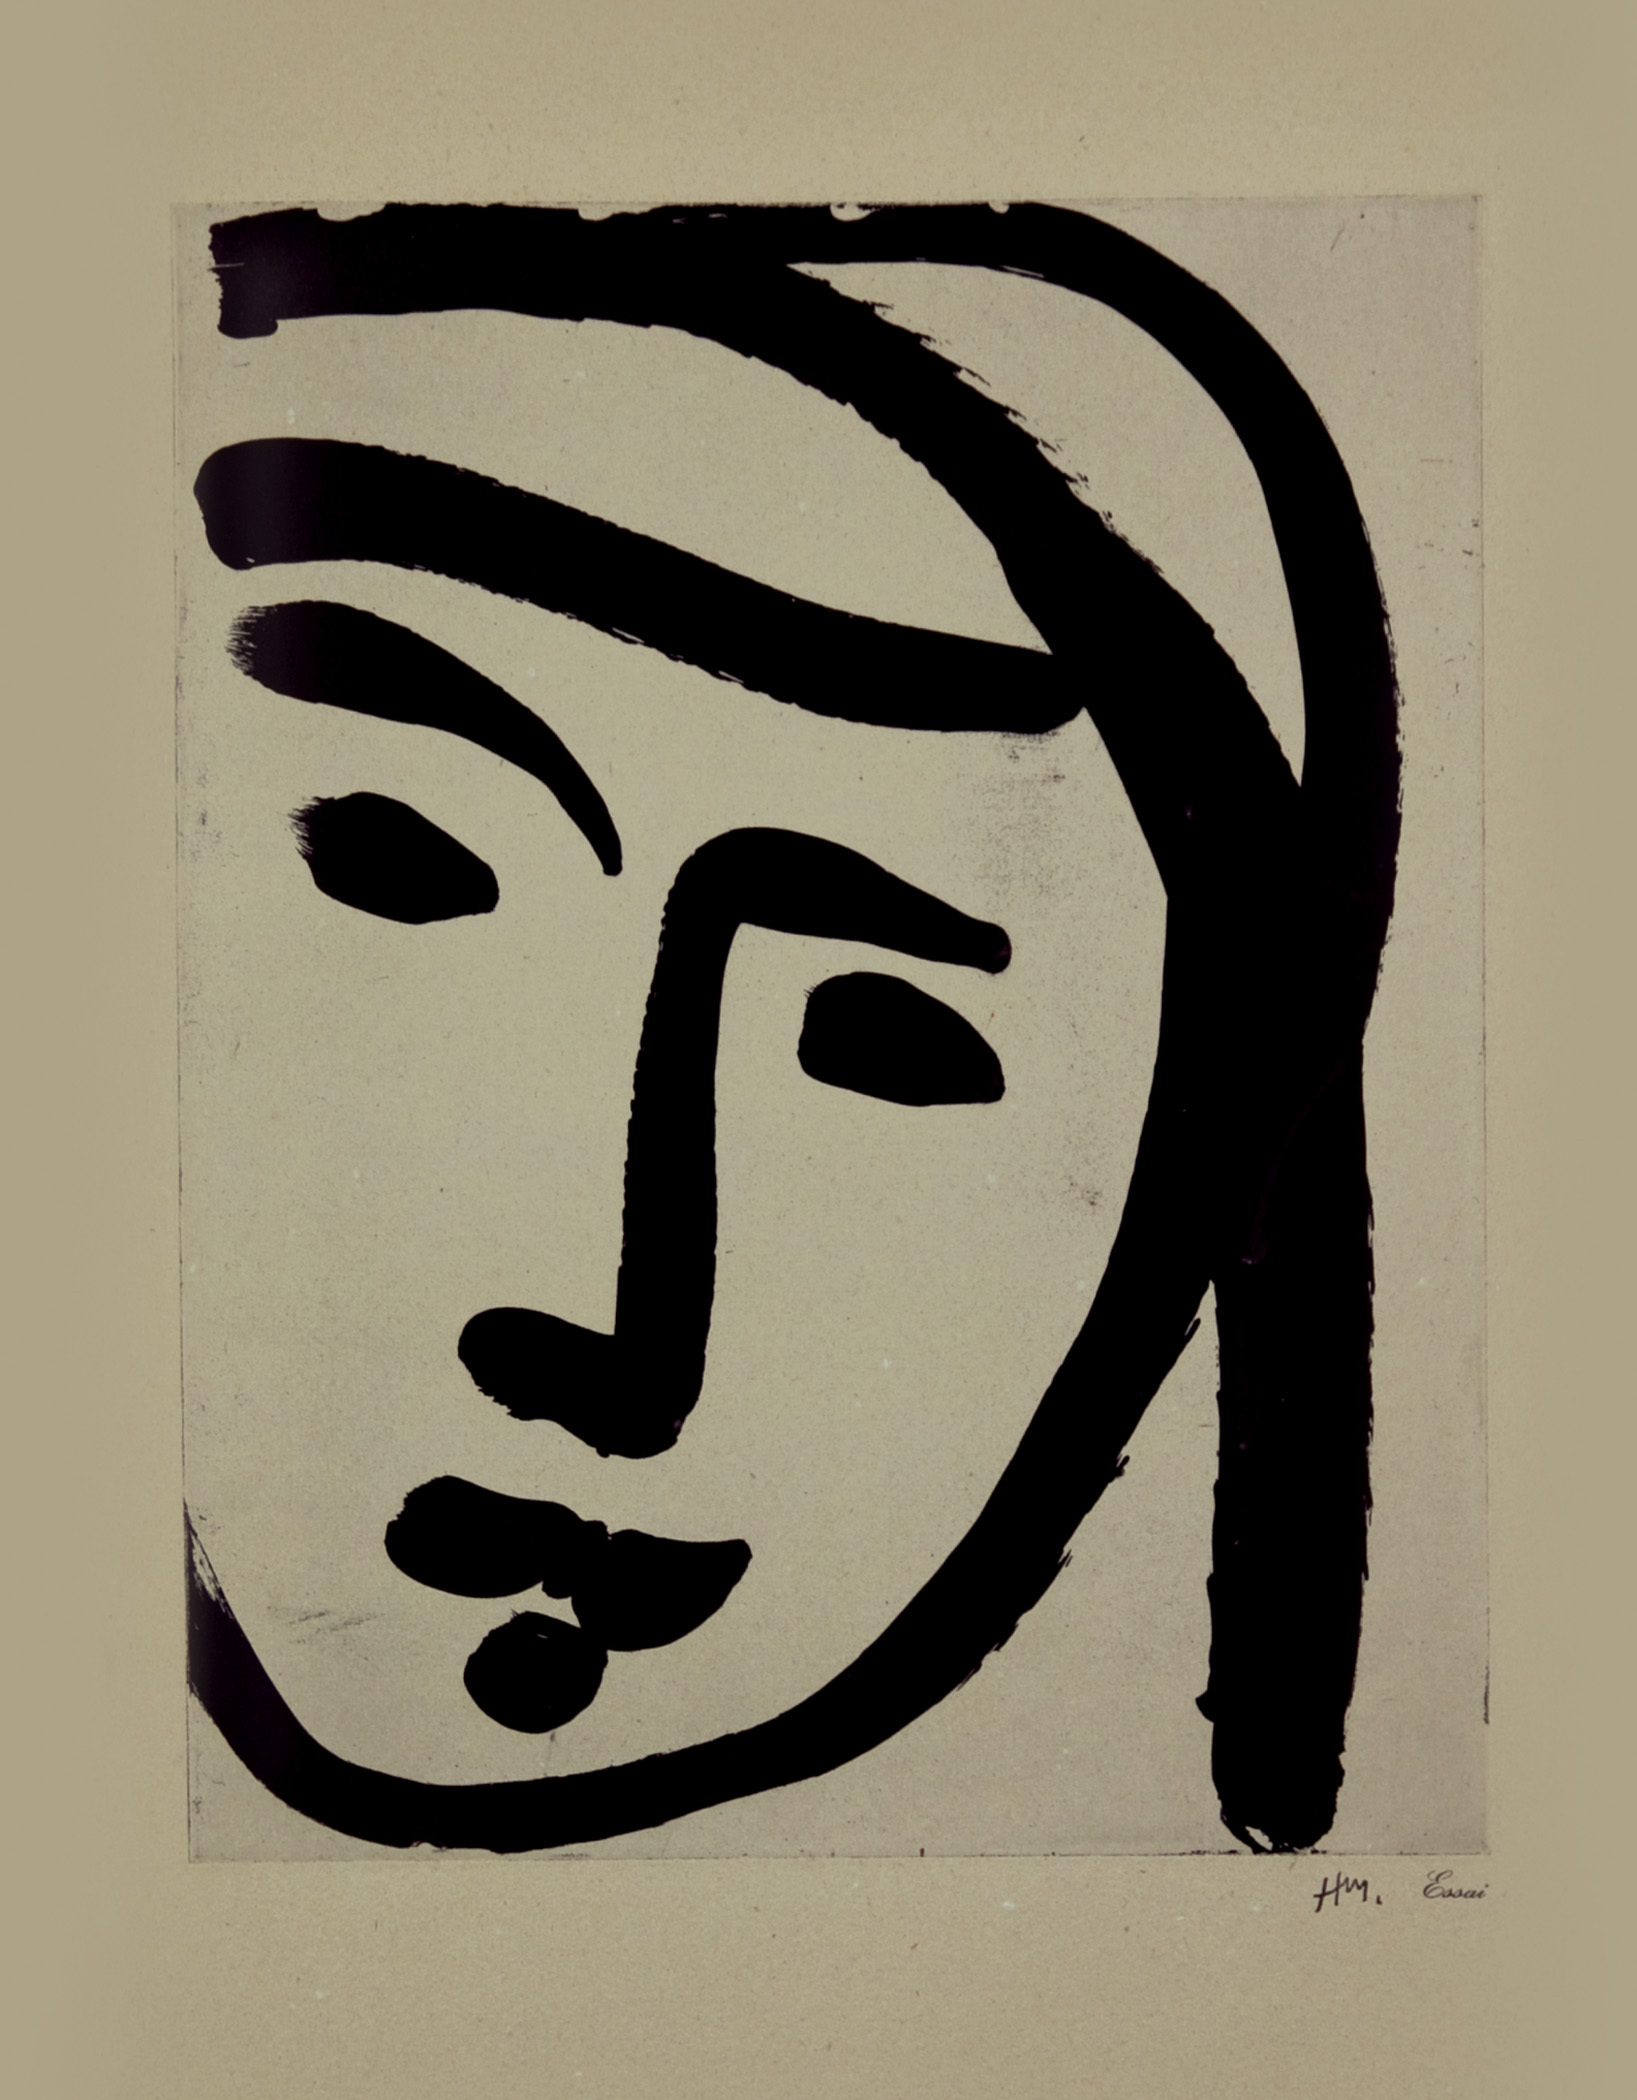 Henri Matisse. Matisse prints